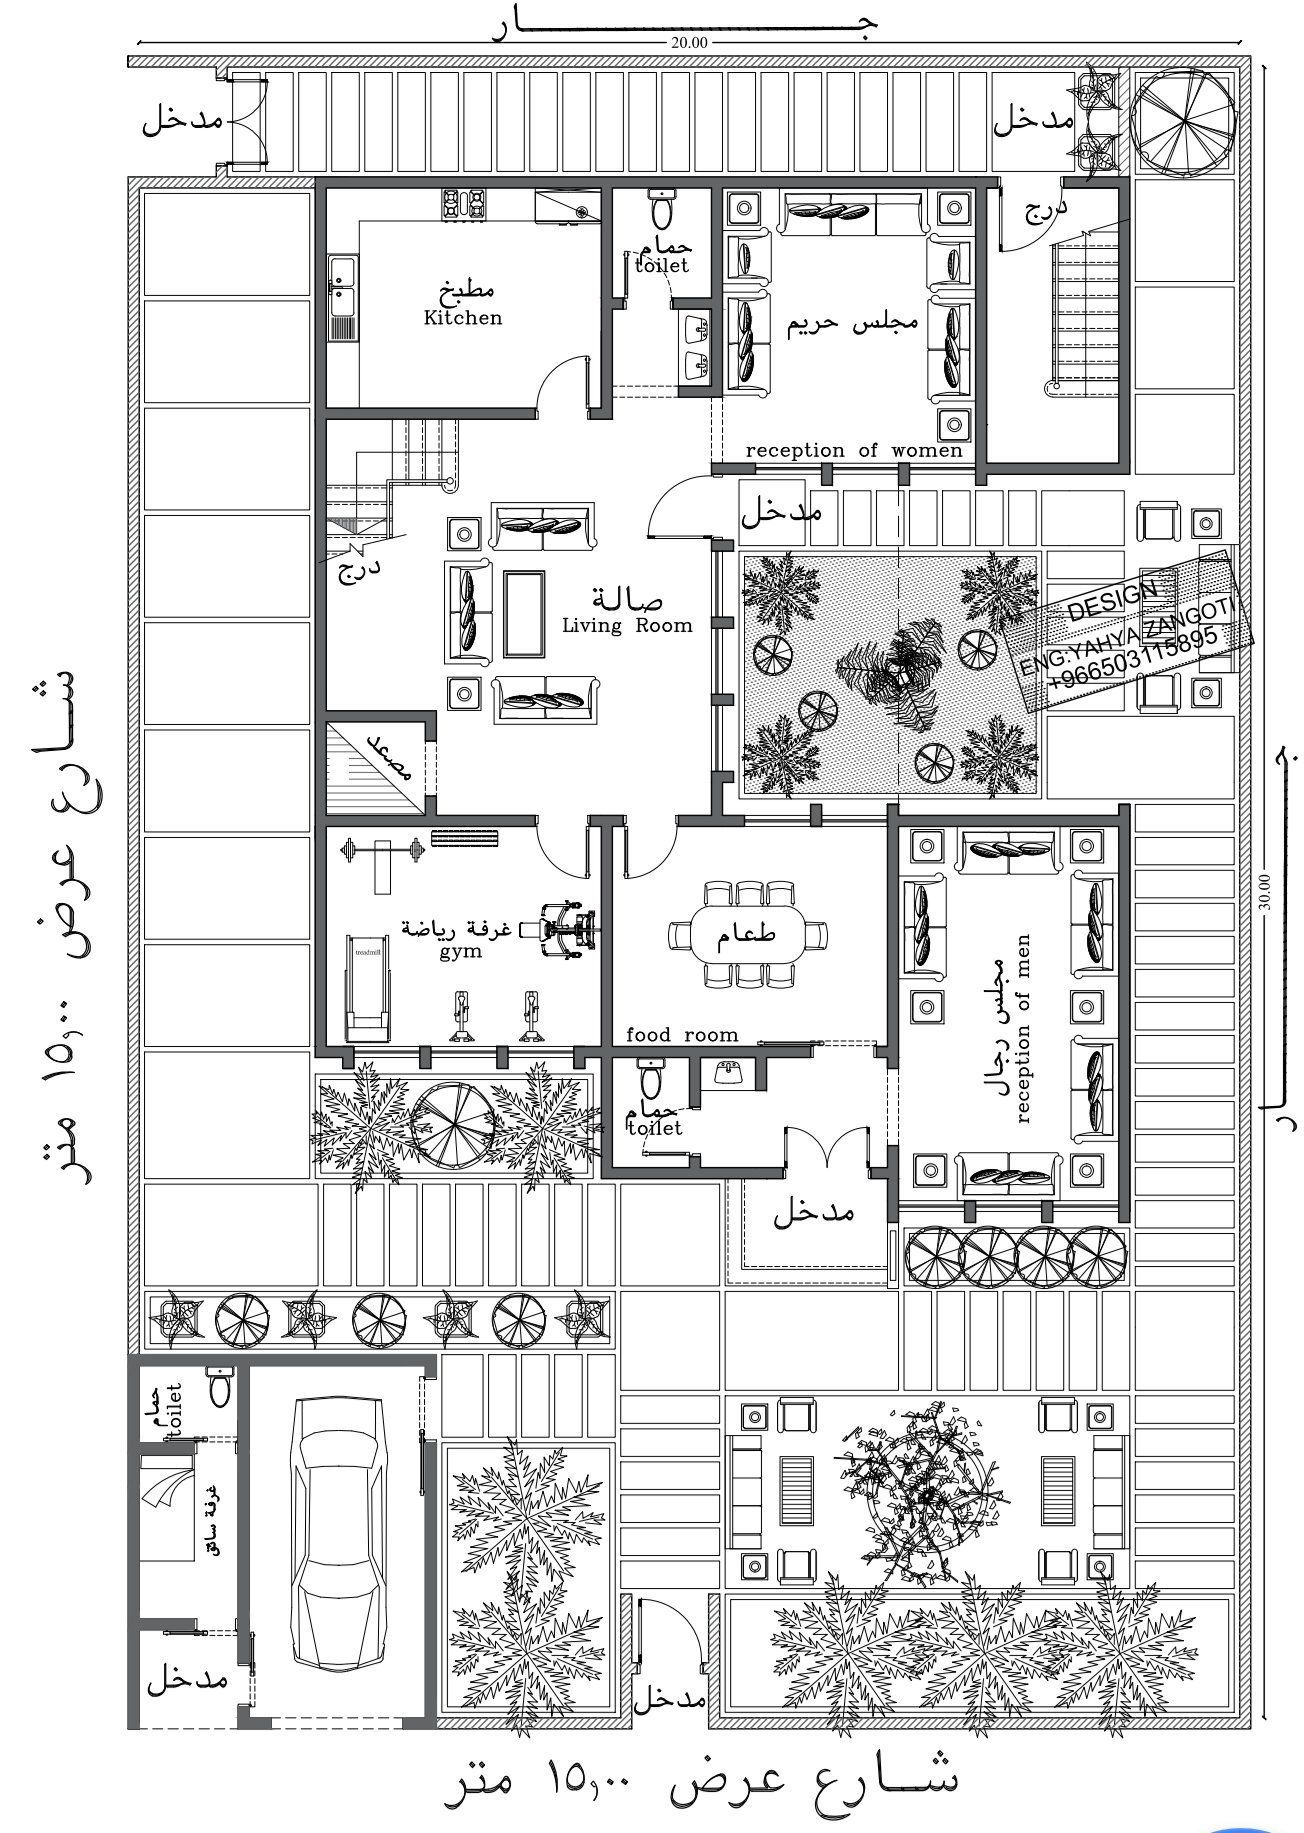 م يحيى زنقوطي Zingoty5 Twitter Model House Plan 2bhk